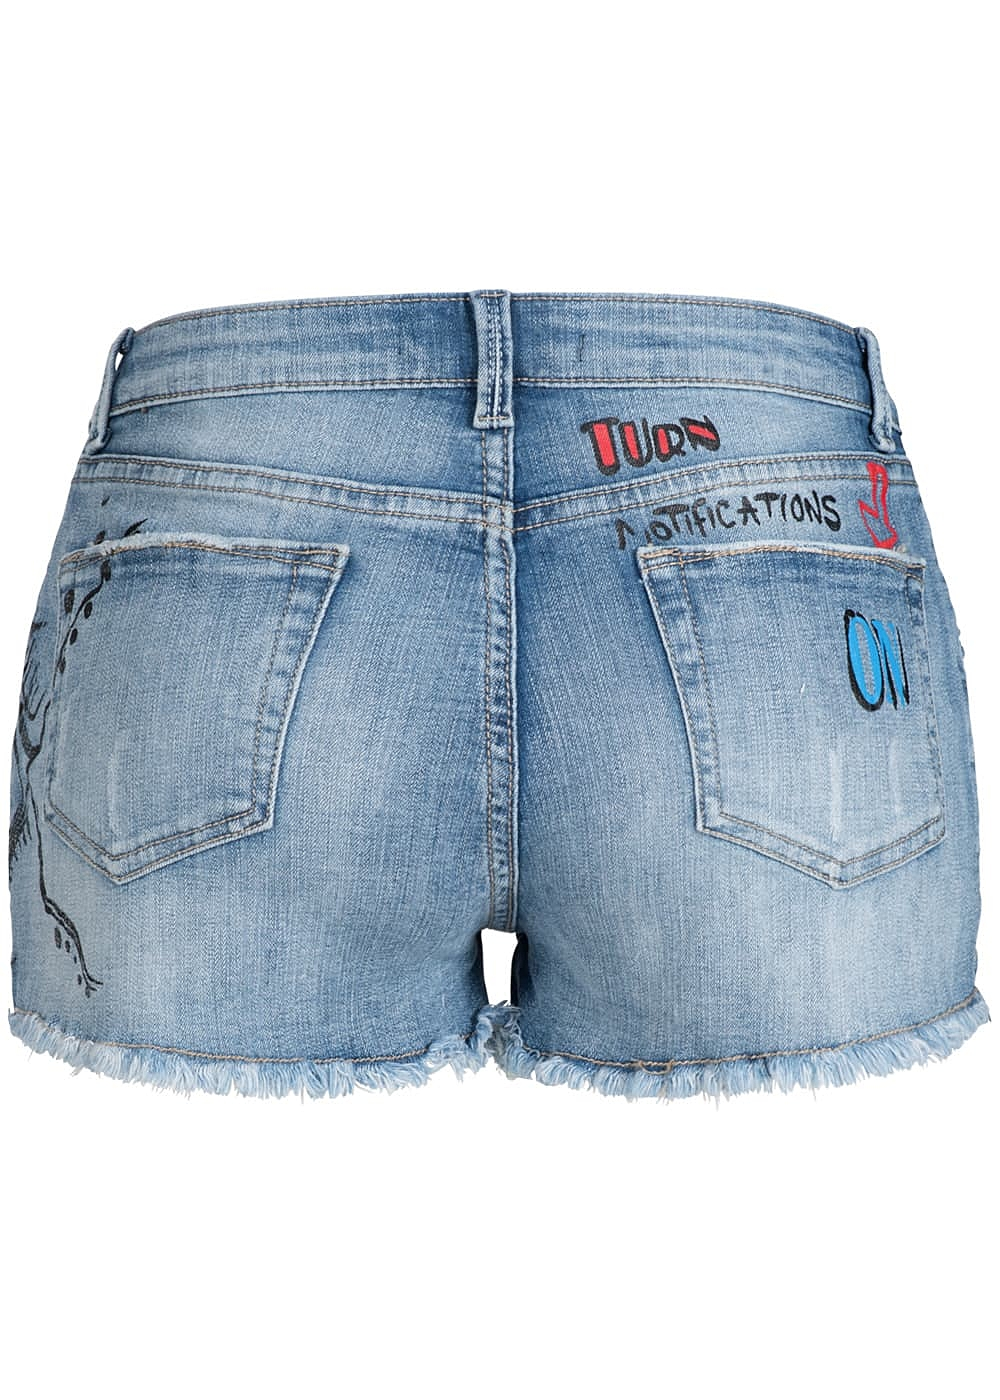 574ea152dbfdd7 Hailys Damen Jeans Short Fransen Comic Art Print destroy look blau ...